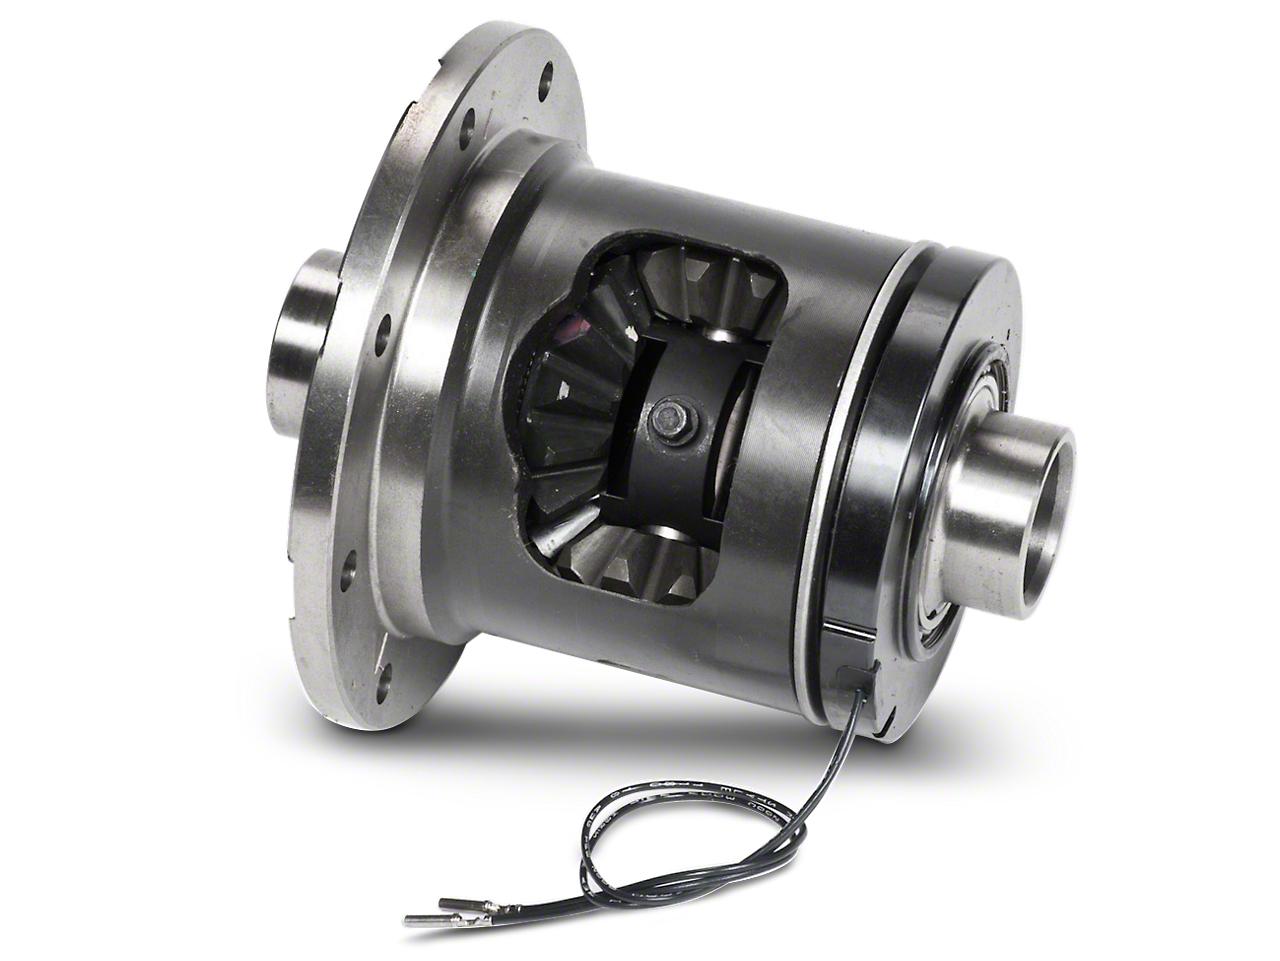 Auburn Gear Ected Max-Locker Differential - Dana 35 - 27 Spline - 3.31 & Lower Gear Ratio (87-07 Wrangler YJ, TJ & JK)